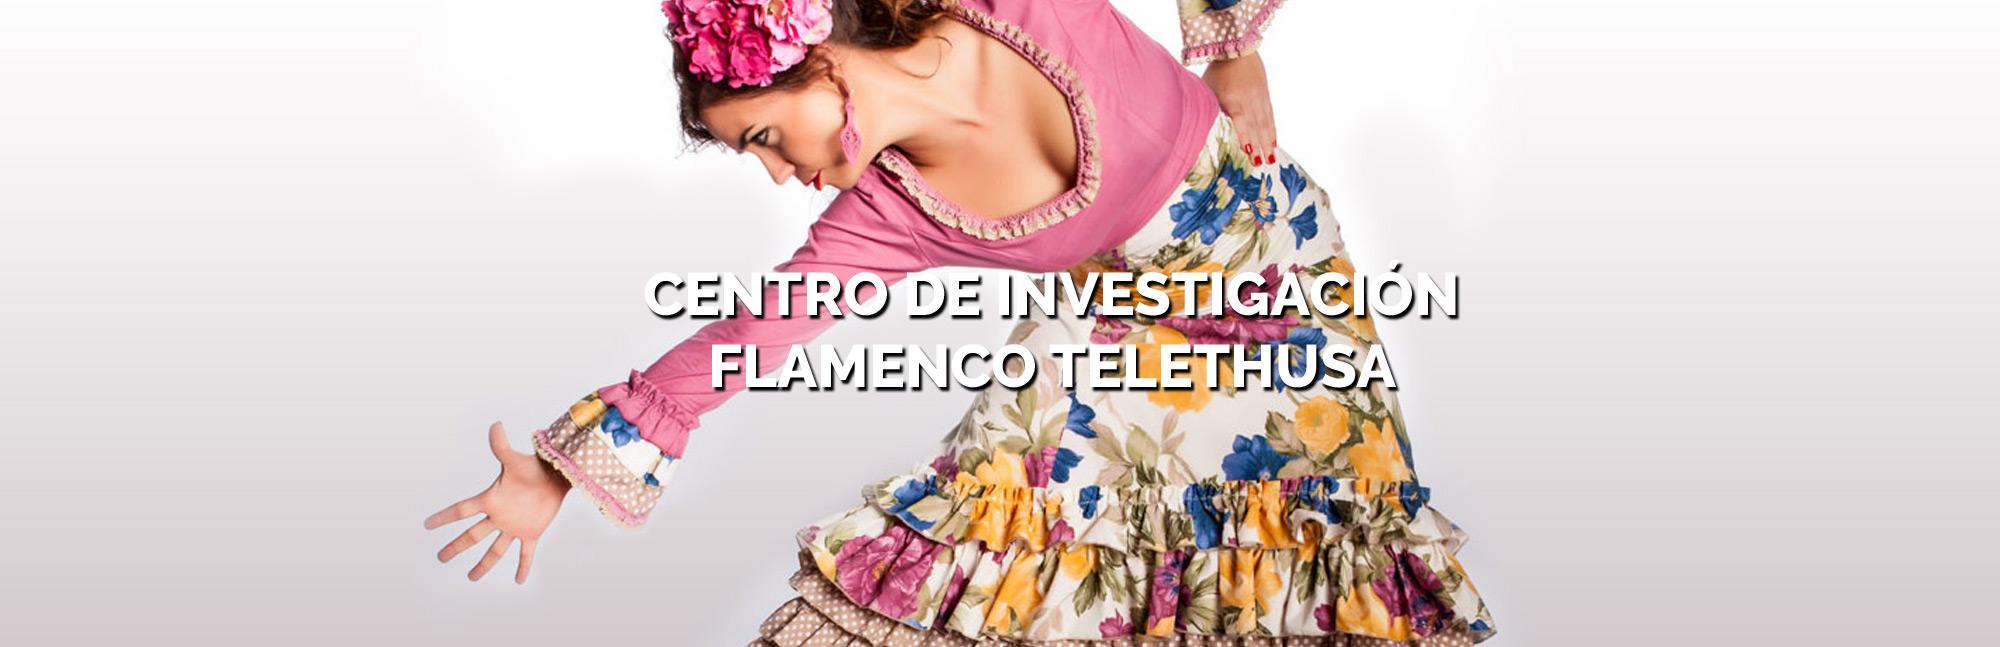 CENTRO INVESTIGACION FLAMENCO TELETHUSA